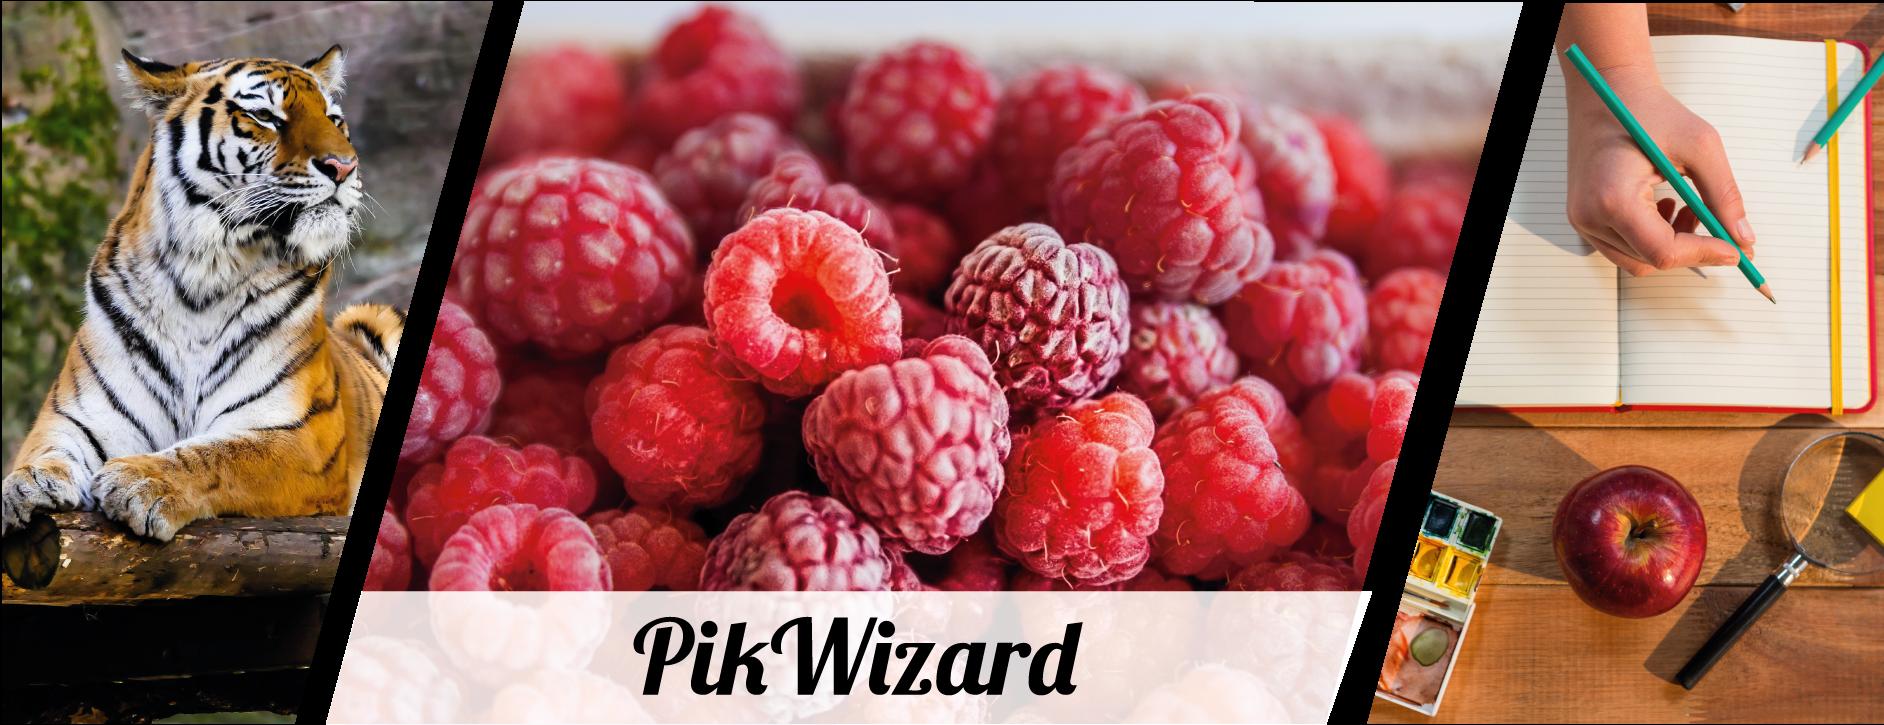 PikWizard image gallery